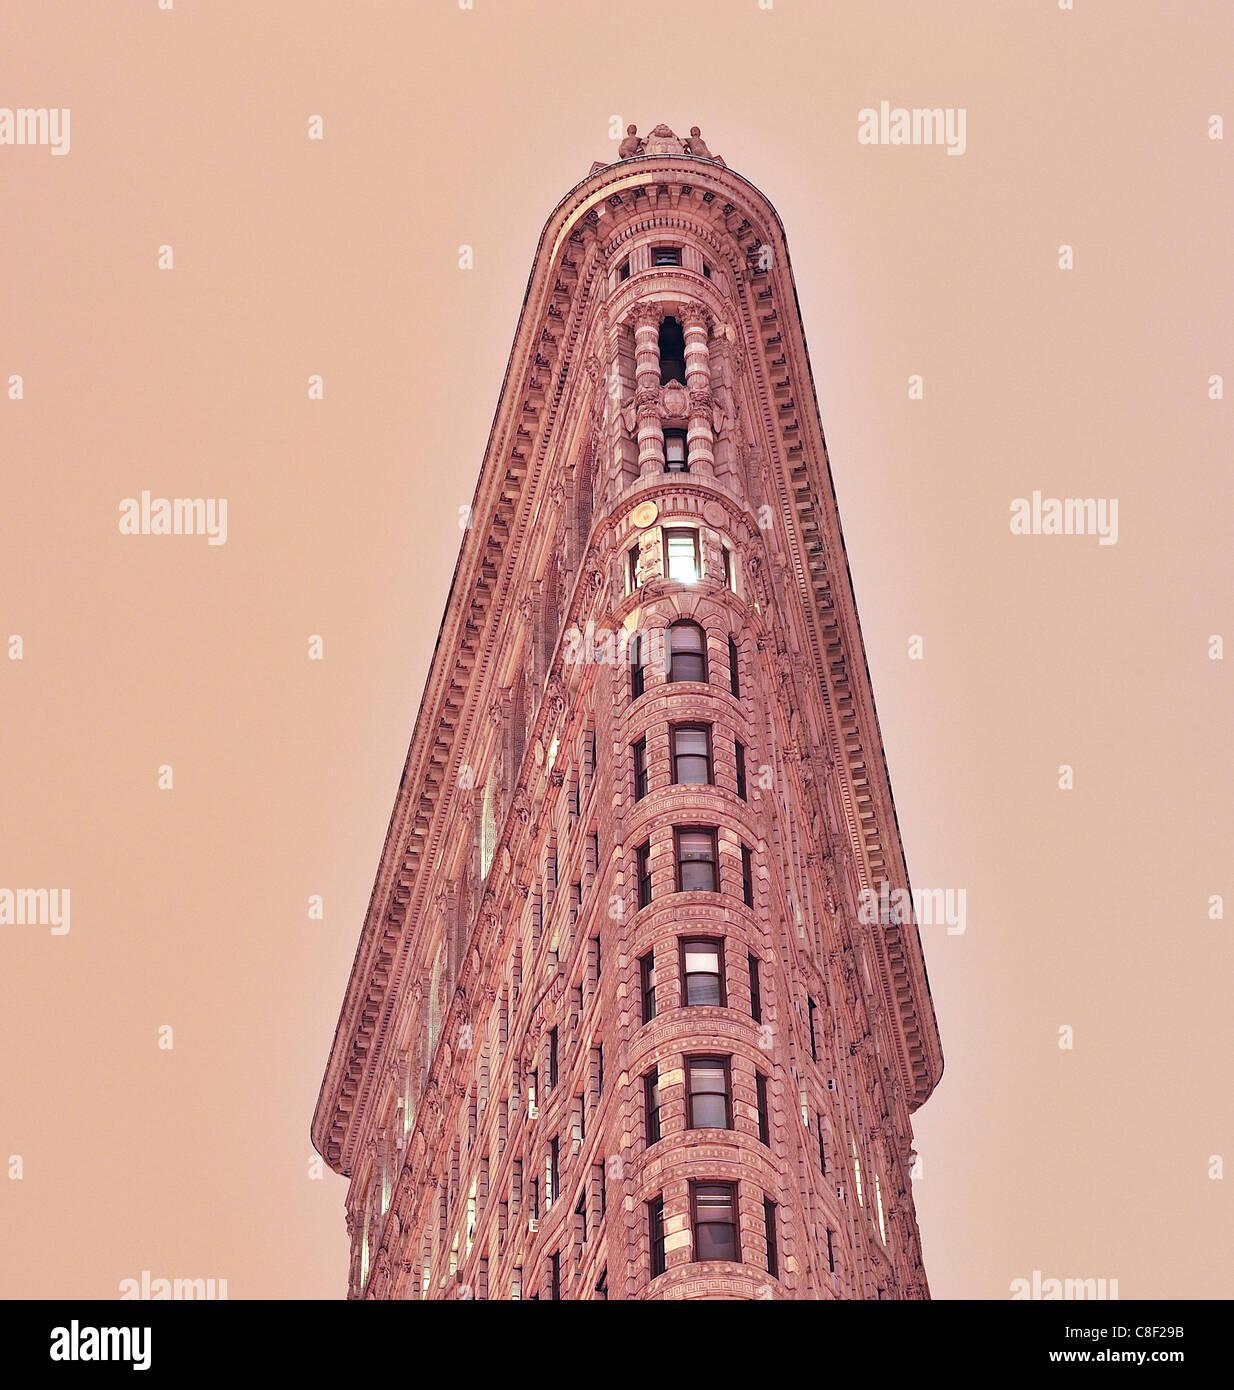 Flatiron, Building, Manhattan, New York, USA, United States, America, evening - Stock Image